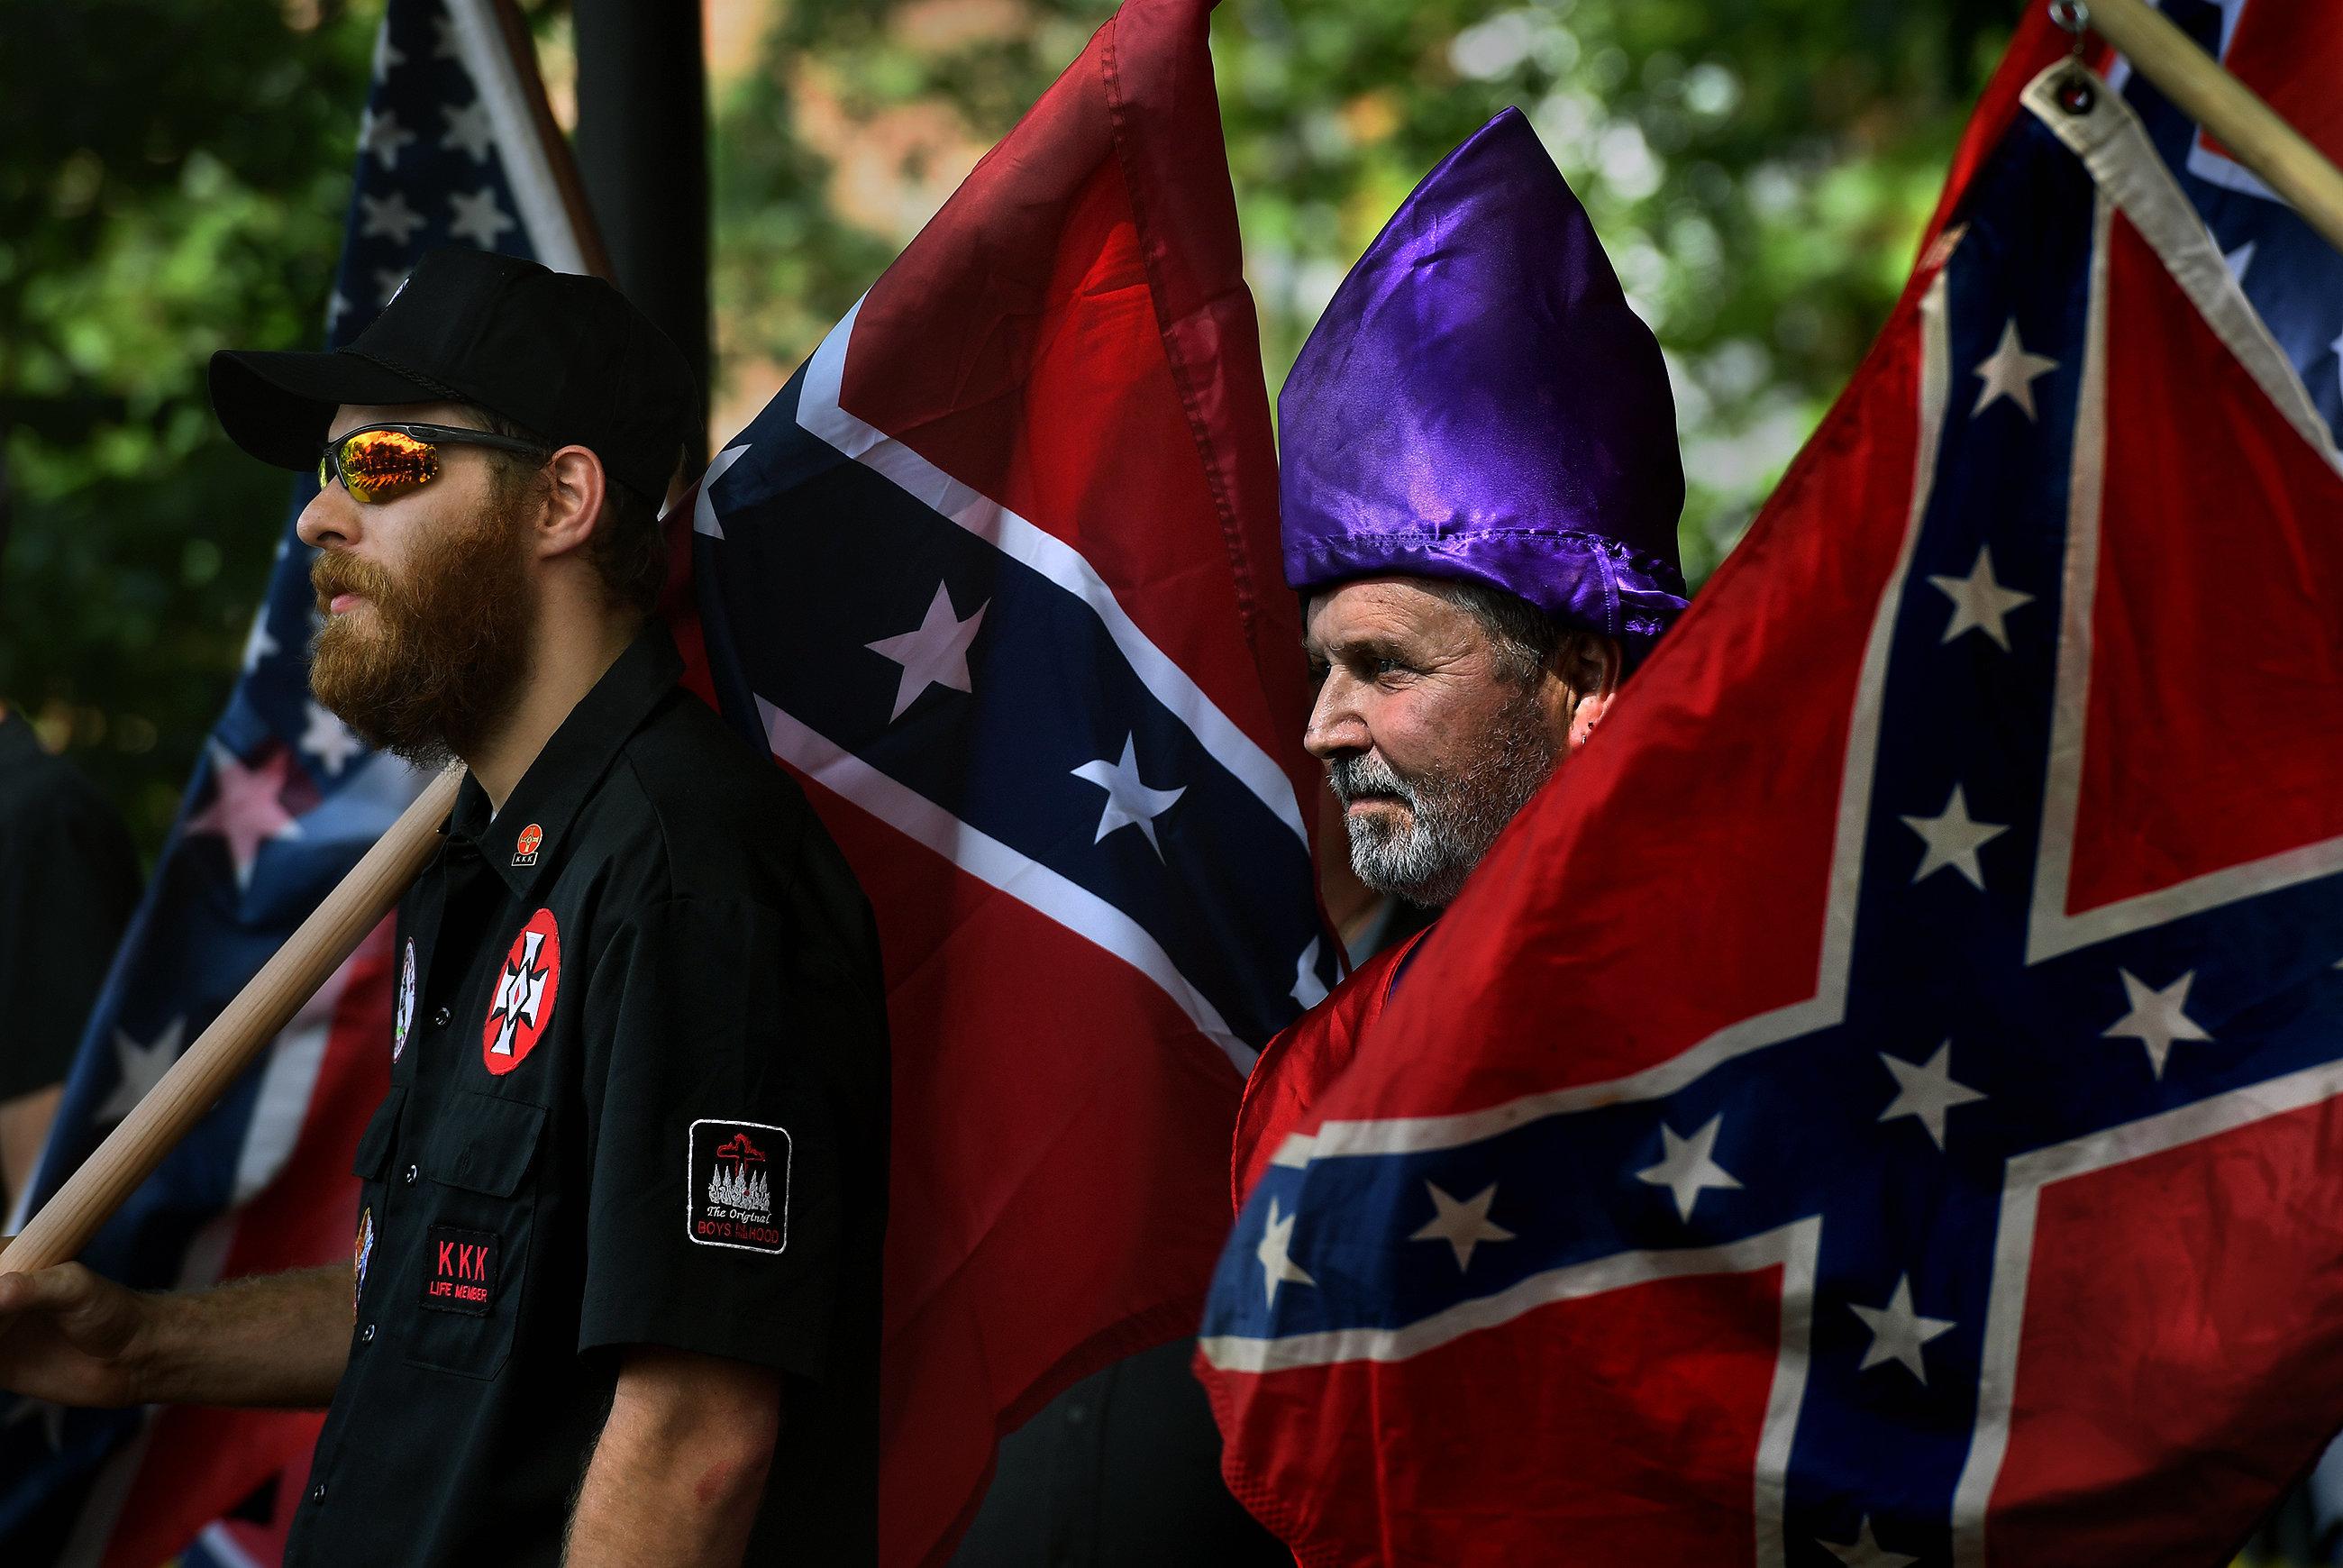 Neo-Nazi Site Daily Stormer Praises Trump's Charlottesville Reaction: 'He Loves Us All'